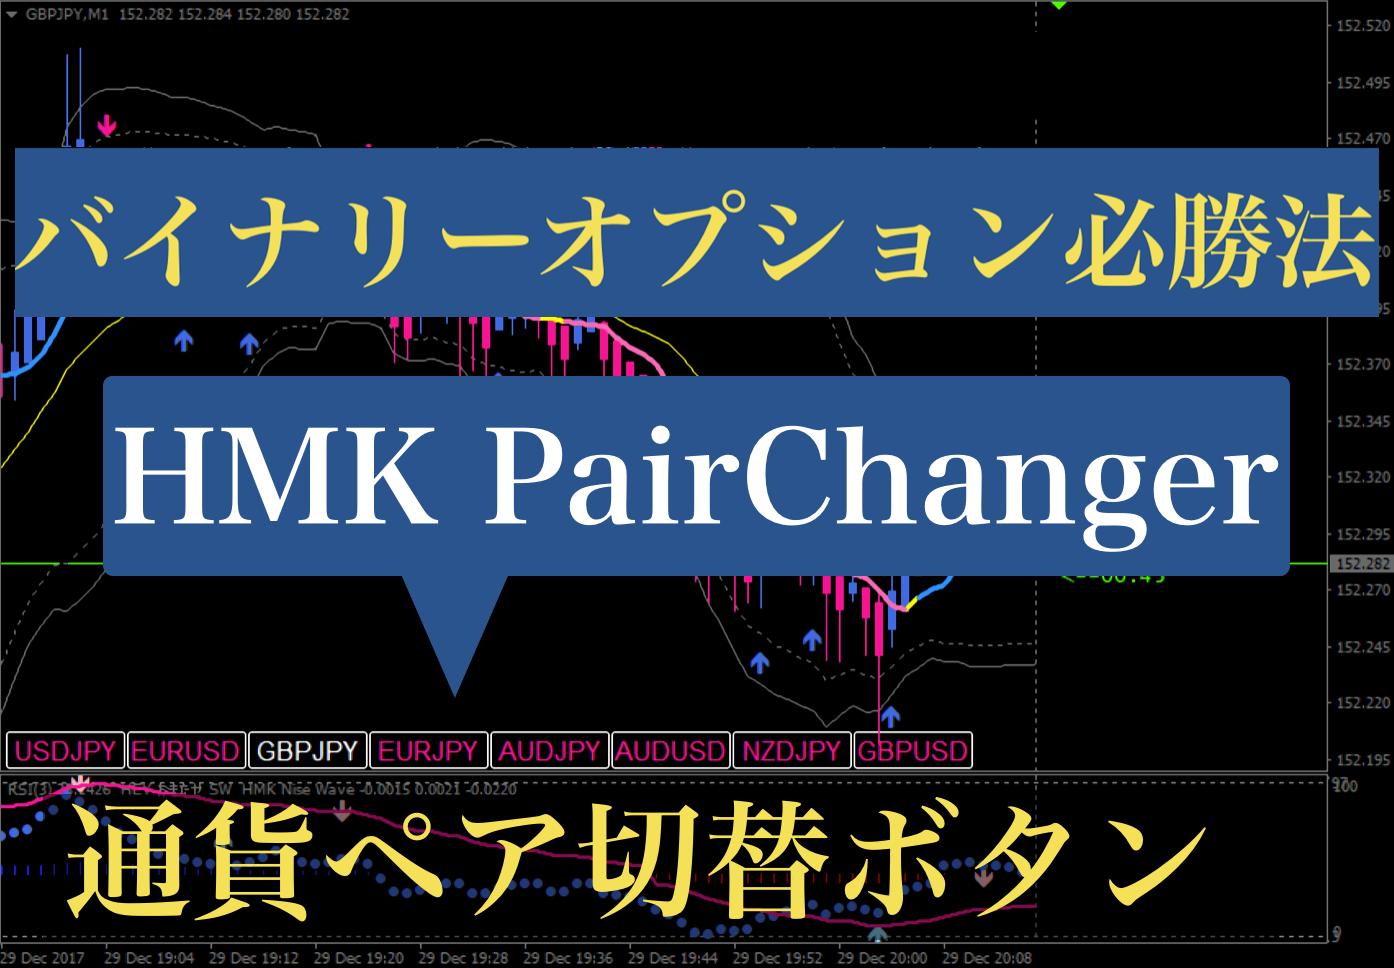 HMKPairchanger.png